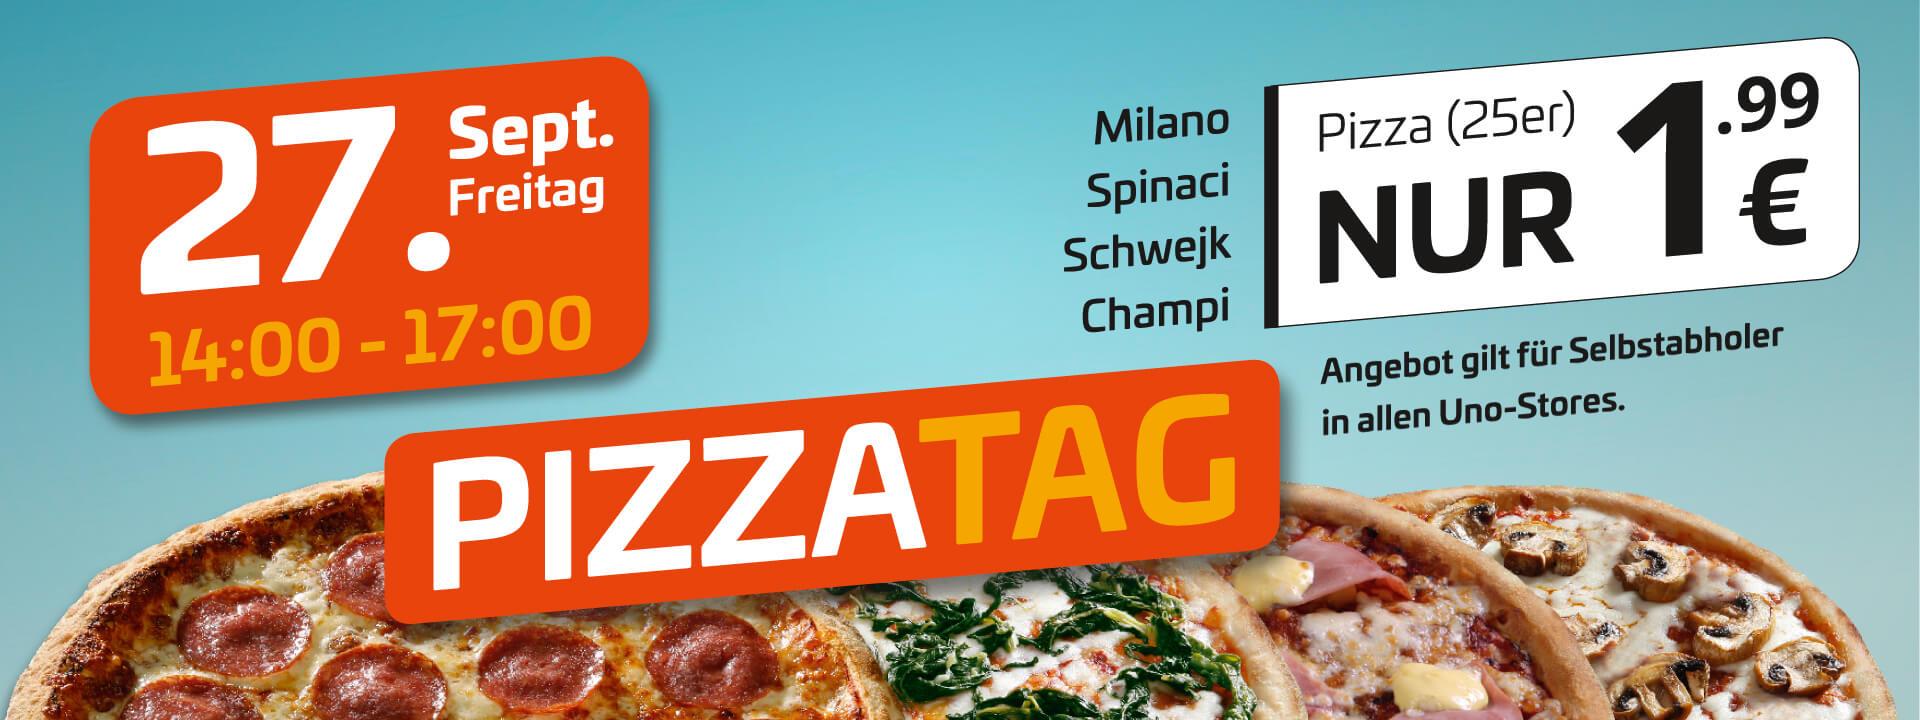 [lokal Magdeburg, Halle, Leipzig, Merseburg] uno Pizza Milano, Spinaci, Schwejk, Champi (25 cm) am Freitag, 27.9. von 14-17 Uhr je 1,99 €